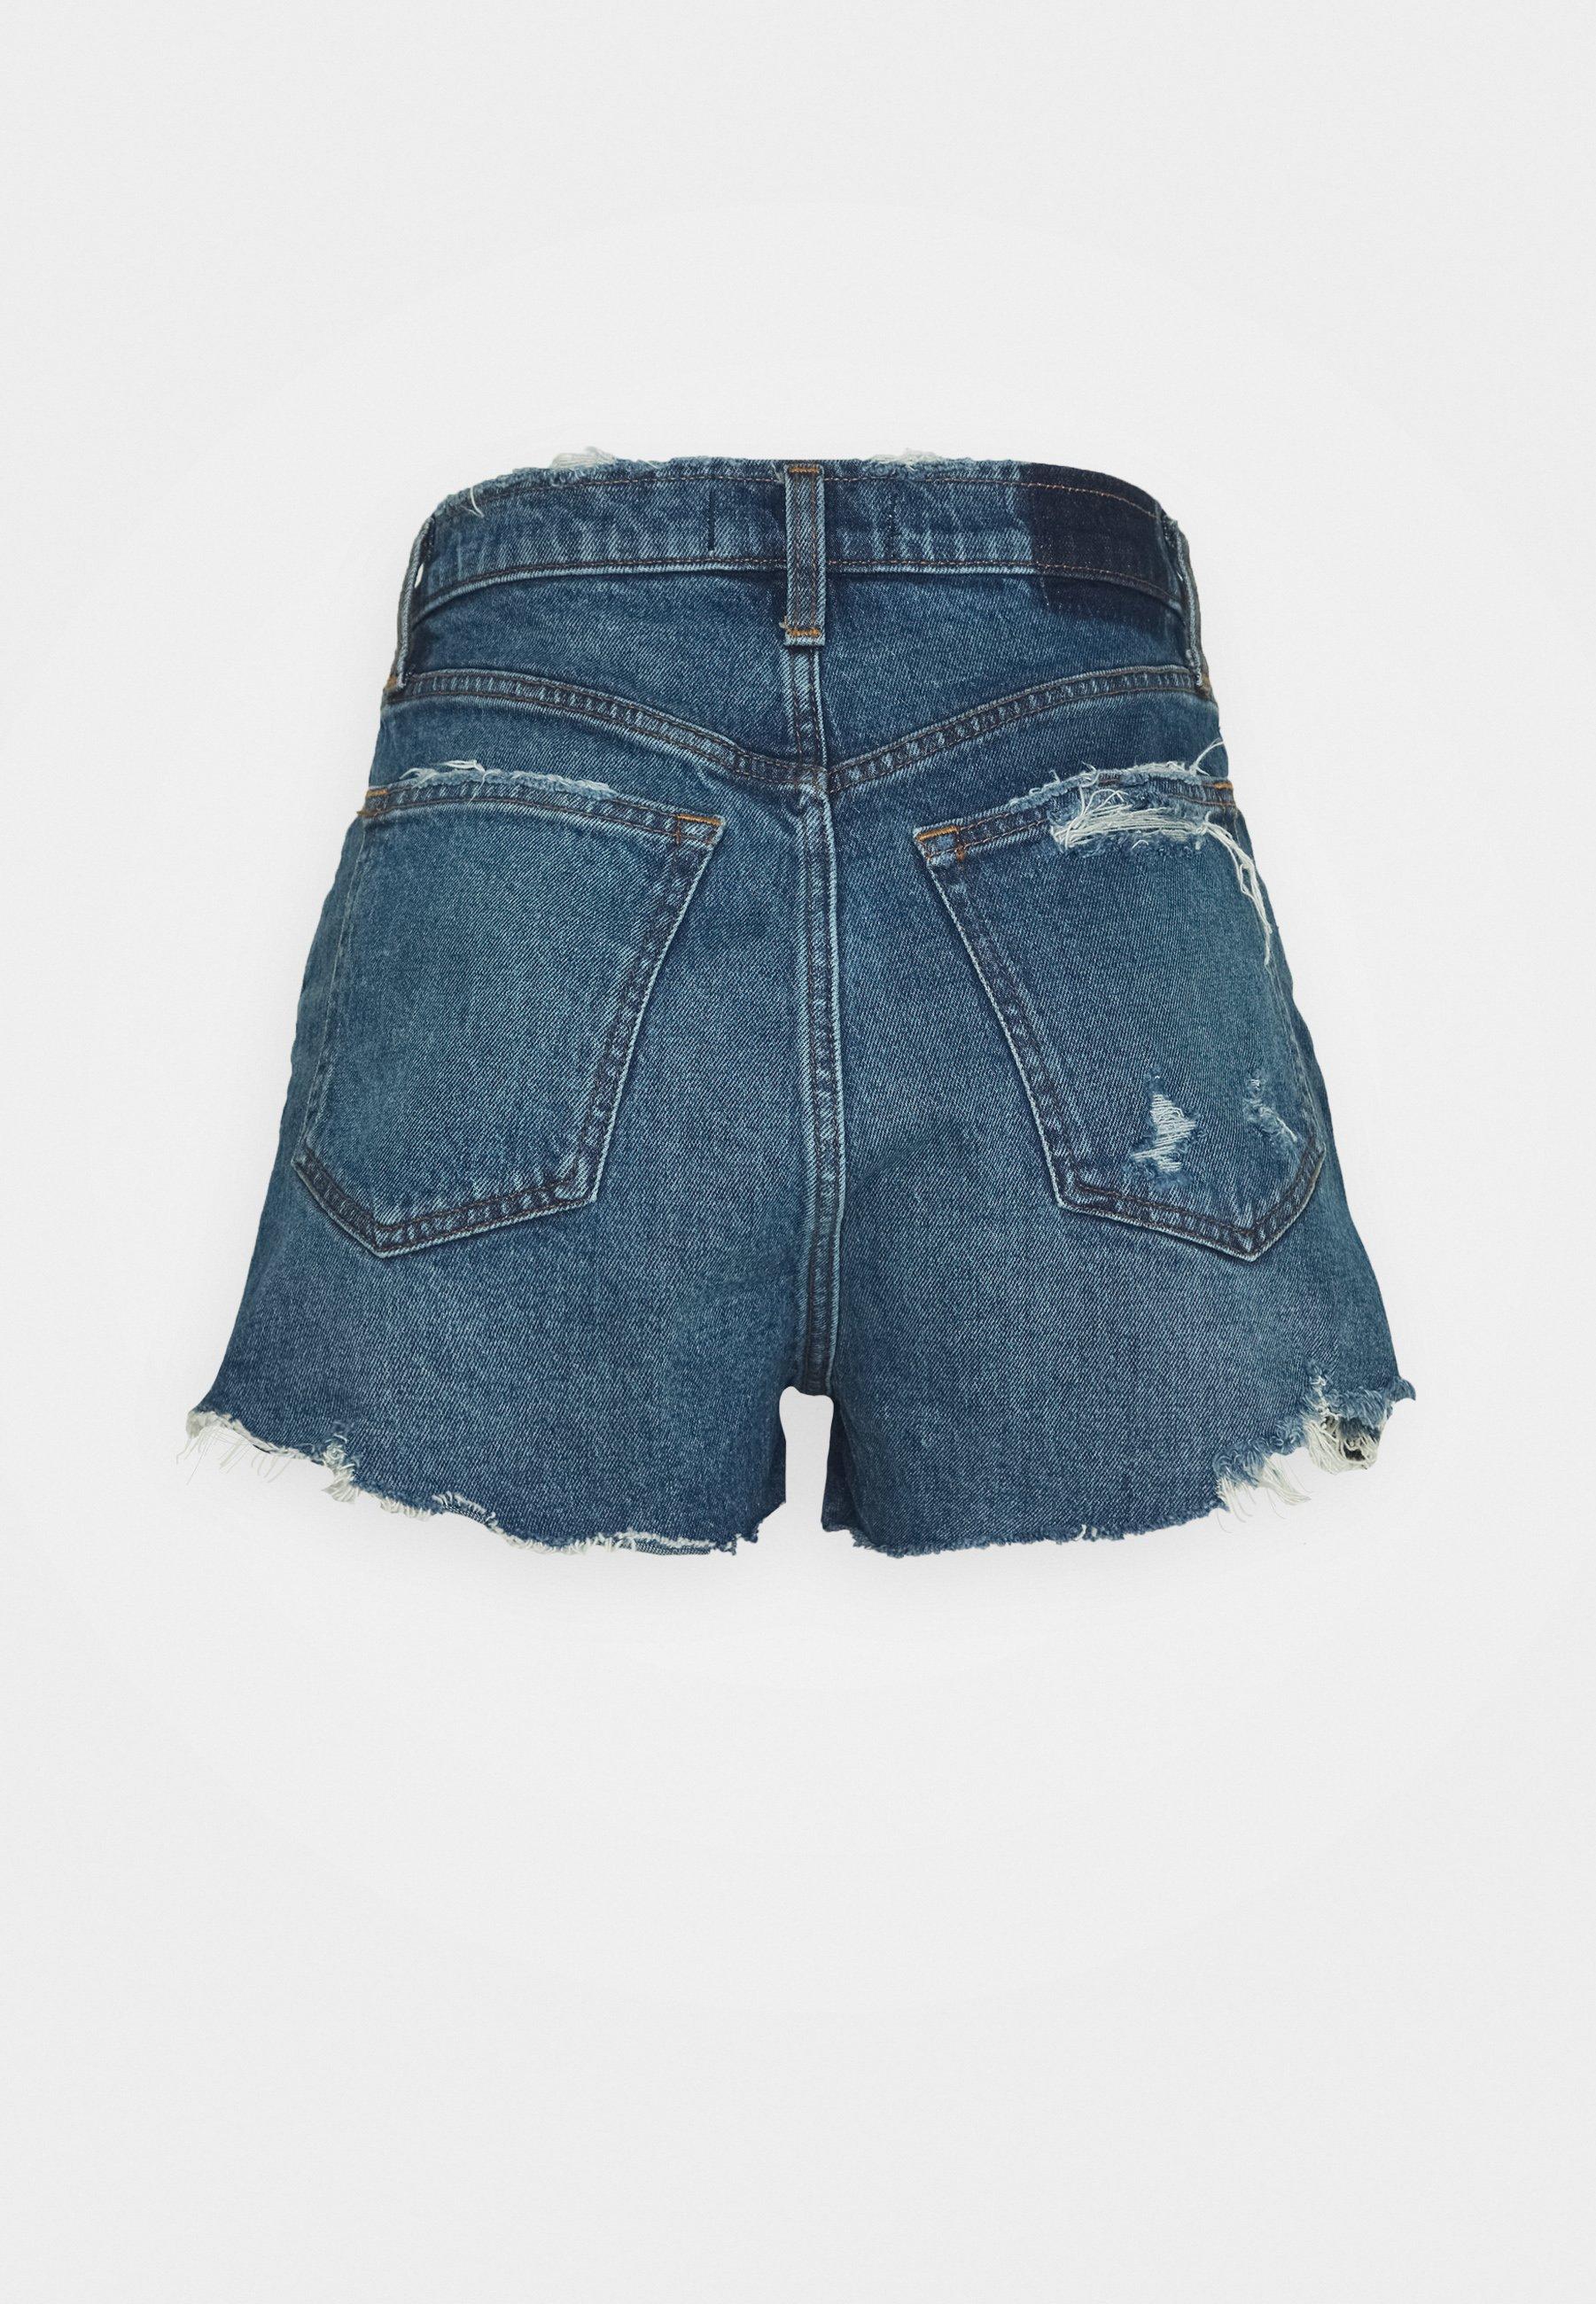 Abercrombie & Fitch Mom Chewy - Jeans Short / Cowboy Shorts Dark-blue Denim